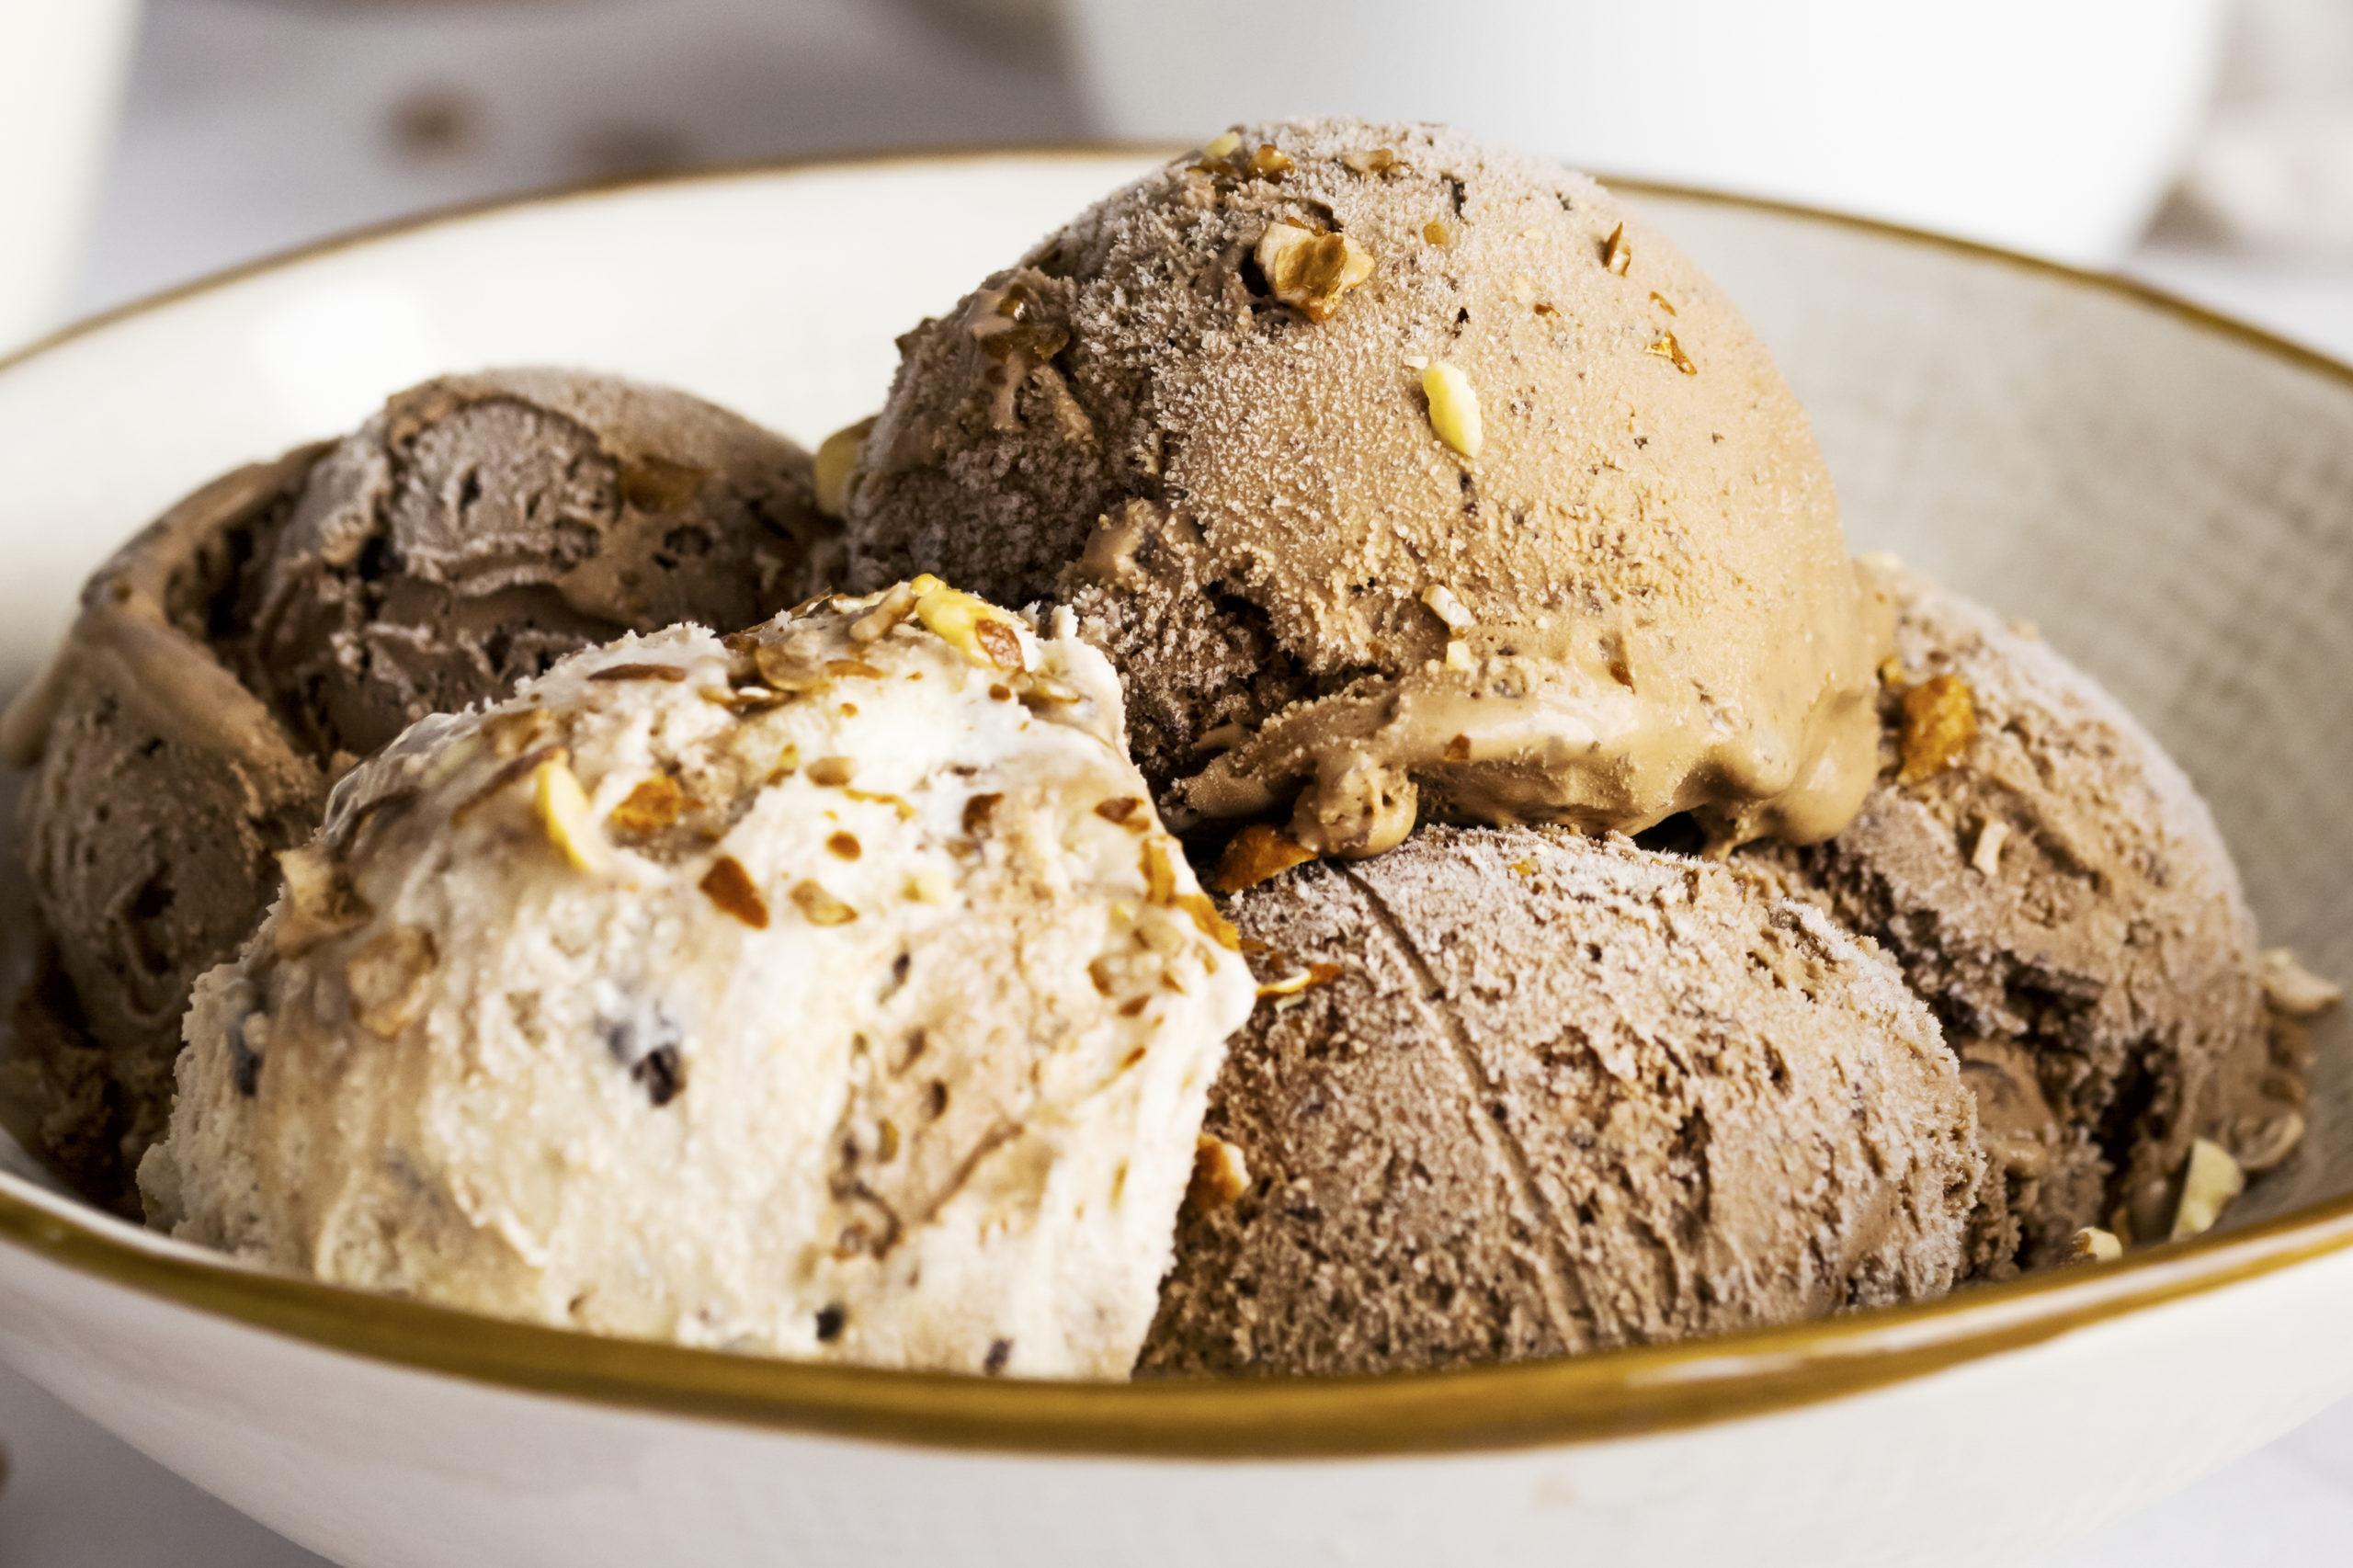 Chocolate and vanilla ice cream bowl dessert close up